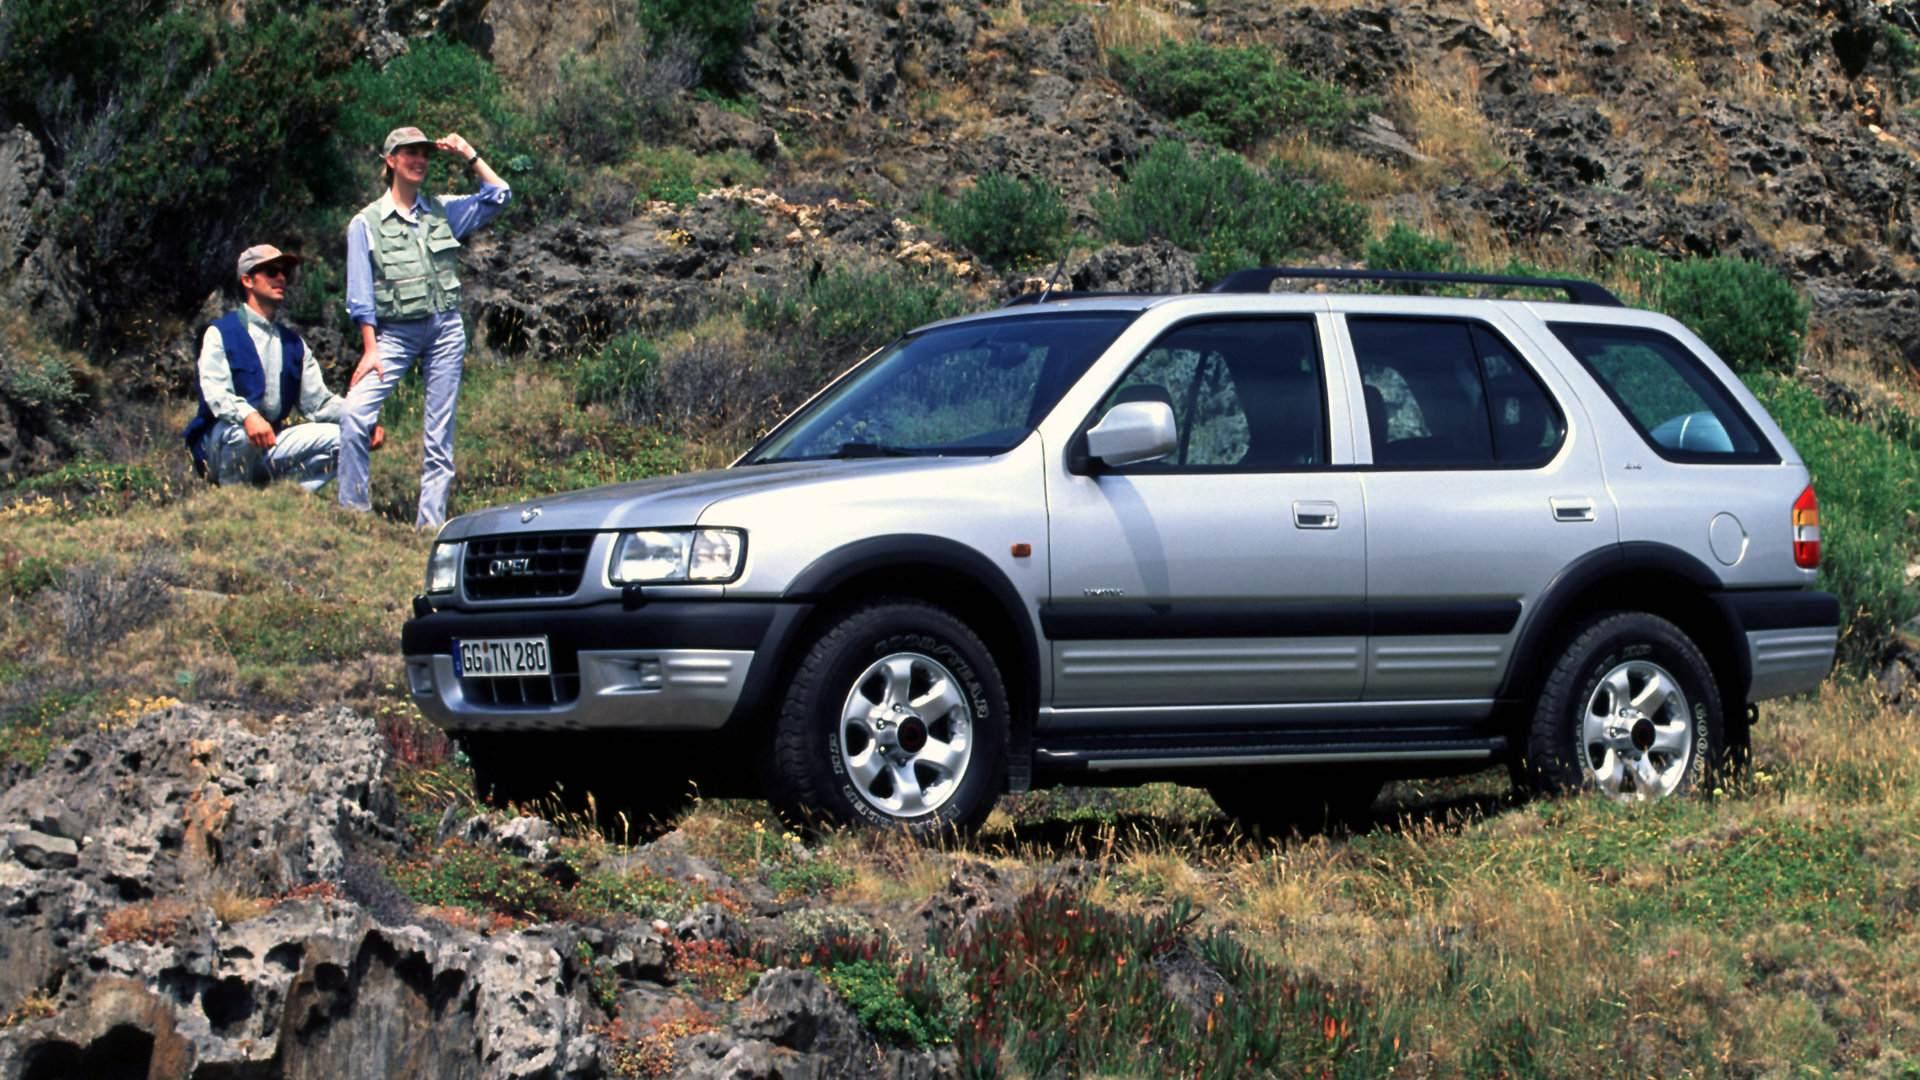 Coche del Día: Opel Frontera 3.2 V6 Limited (B)